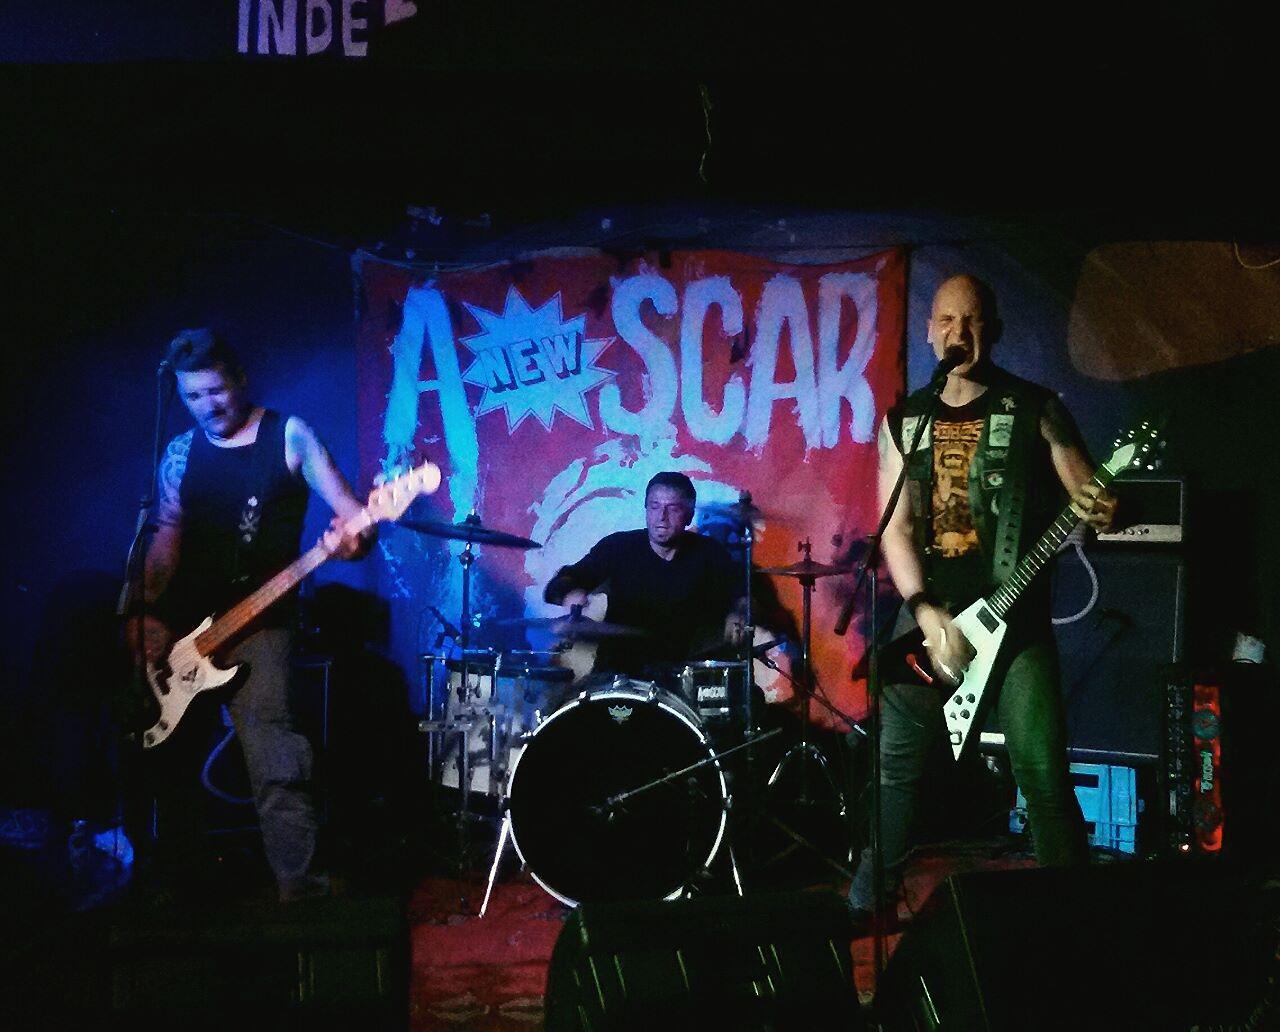 A New Scar @Inde, Koper, 3.6.2016